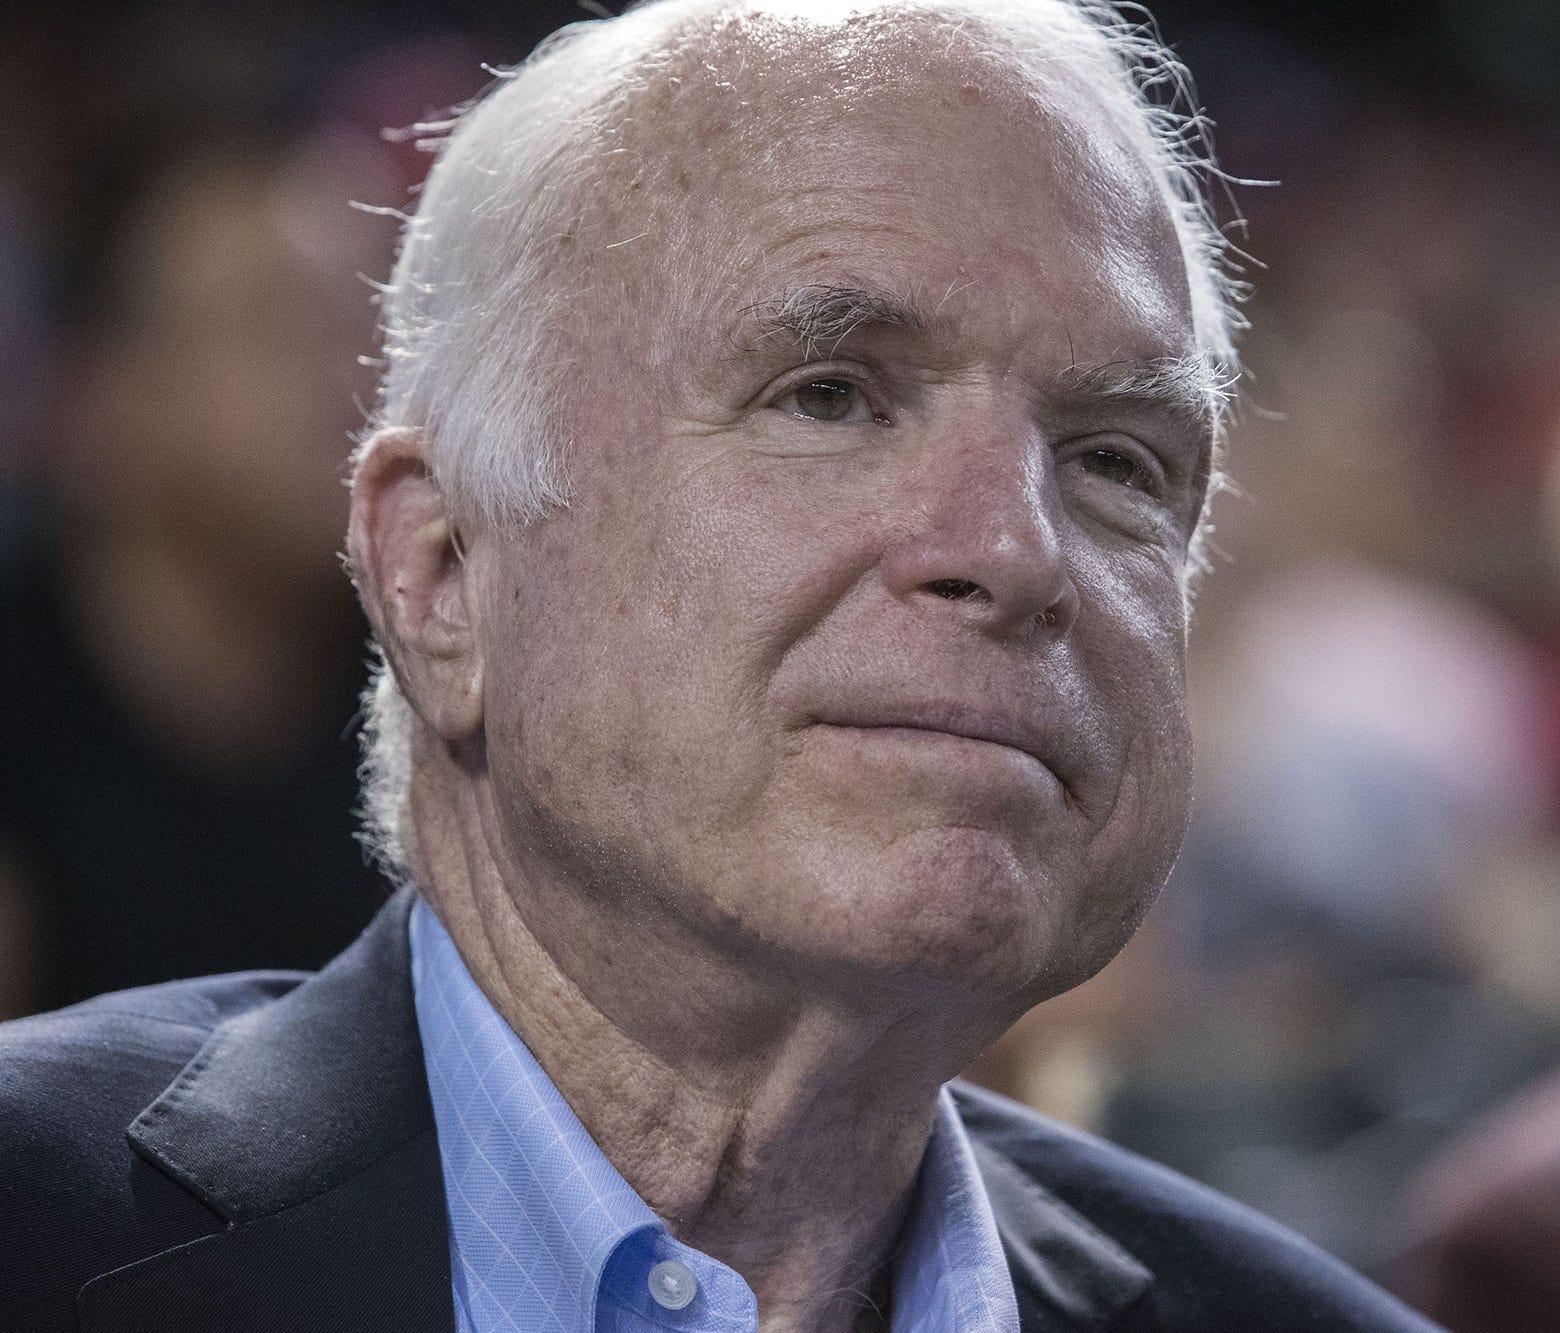 In his forthcoming memoir, Sen. John McCain, R-Ariz., laments a